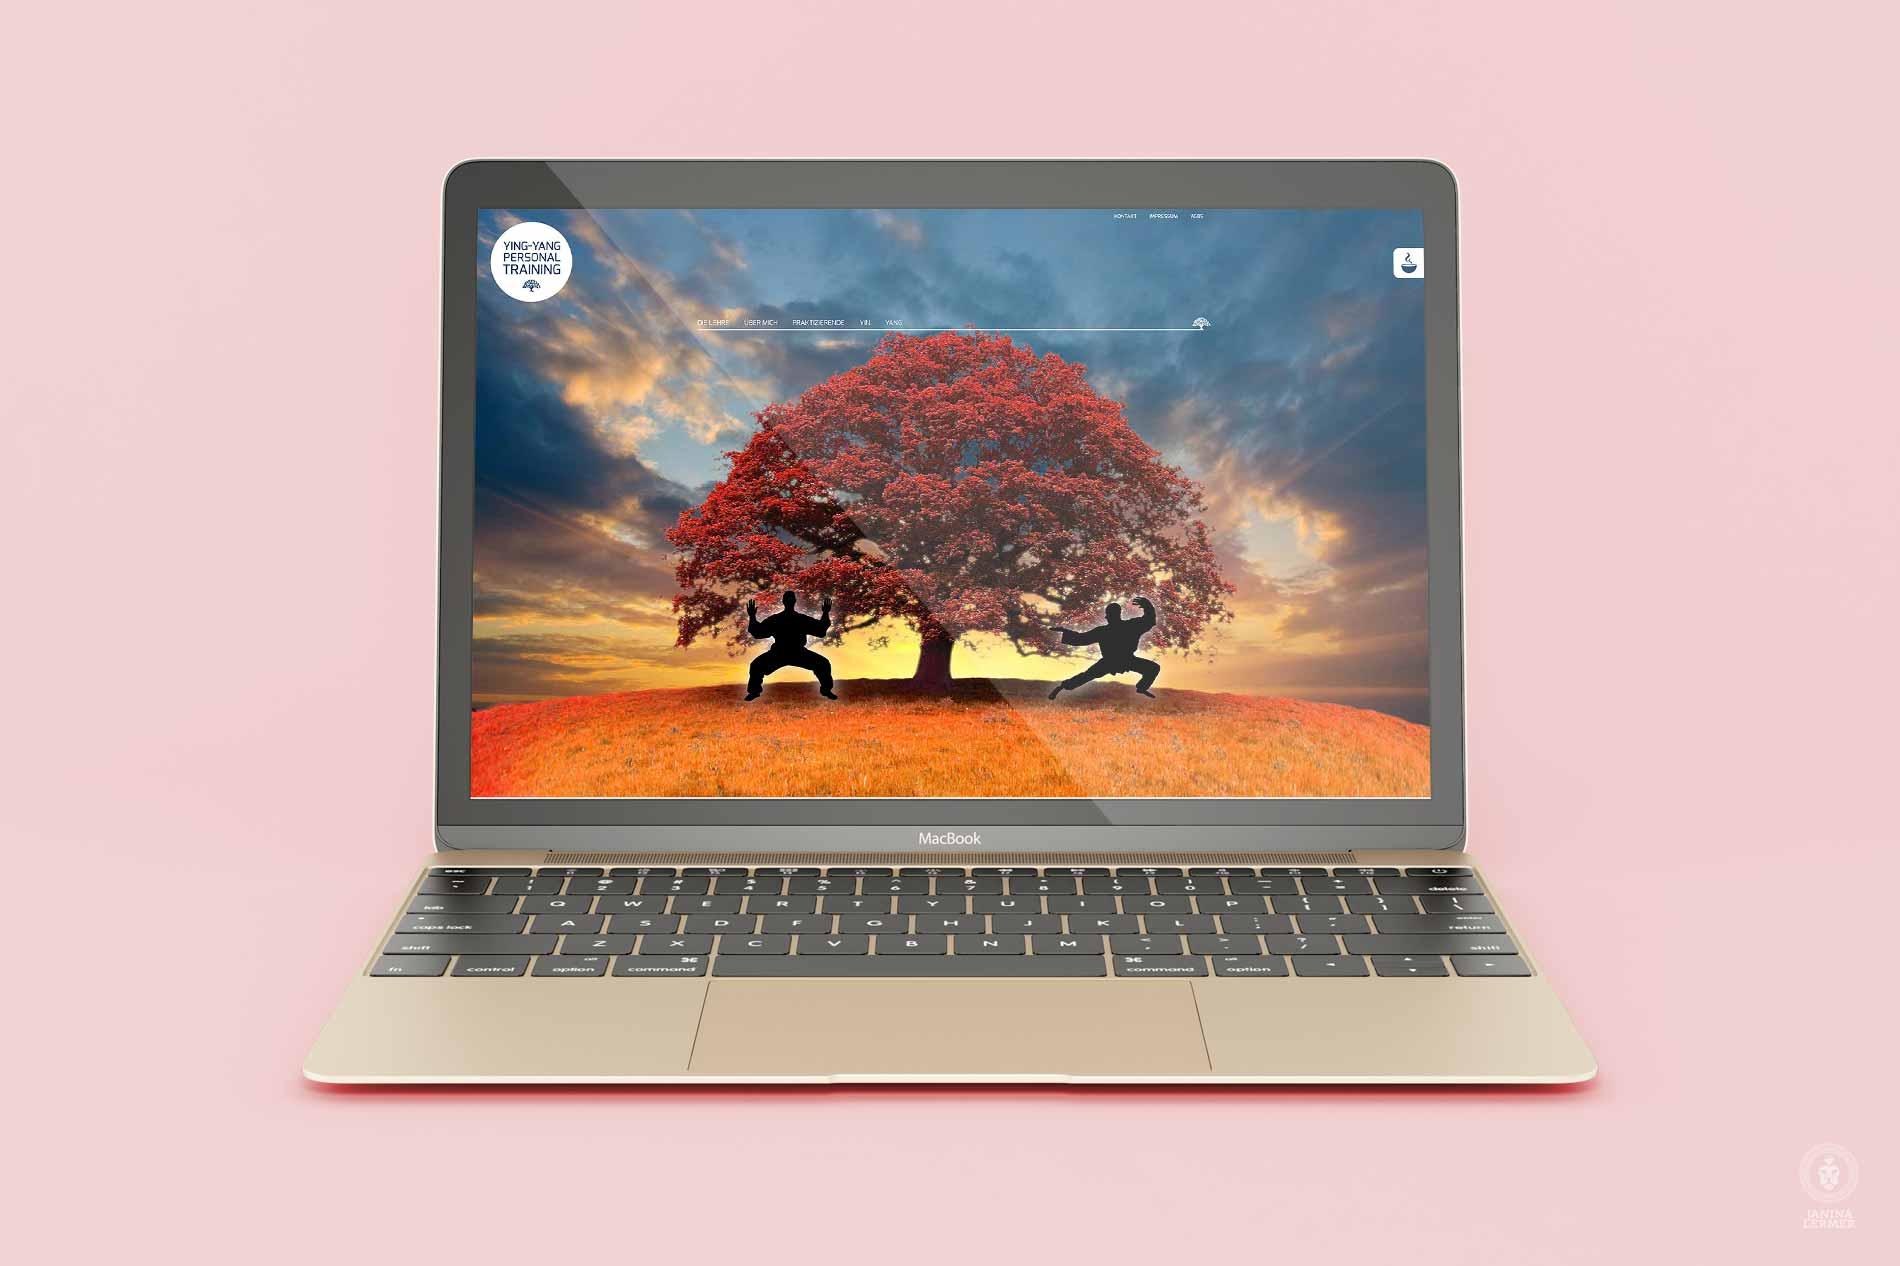 Webseitenkonzept-Webseitengestaltung-Webdesign-Yin-Yang-PersonalTrainer-Ulrich-Lampert-Laptop-Herbst-Autumn